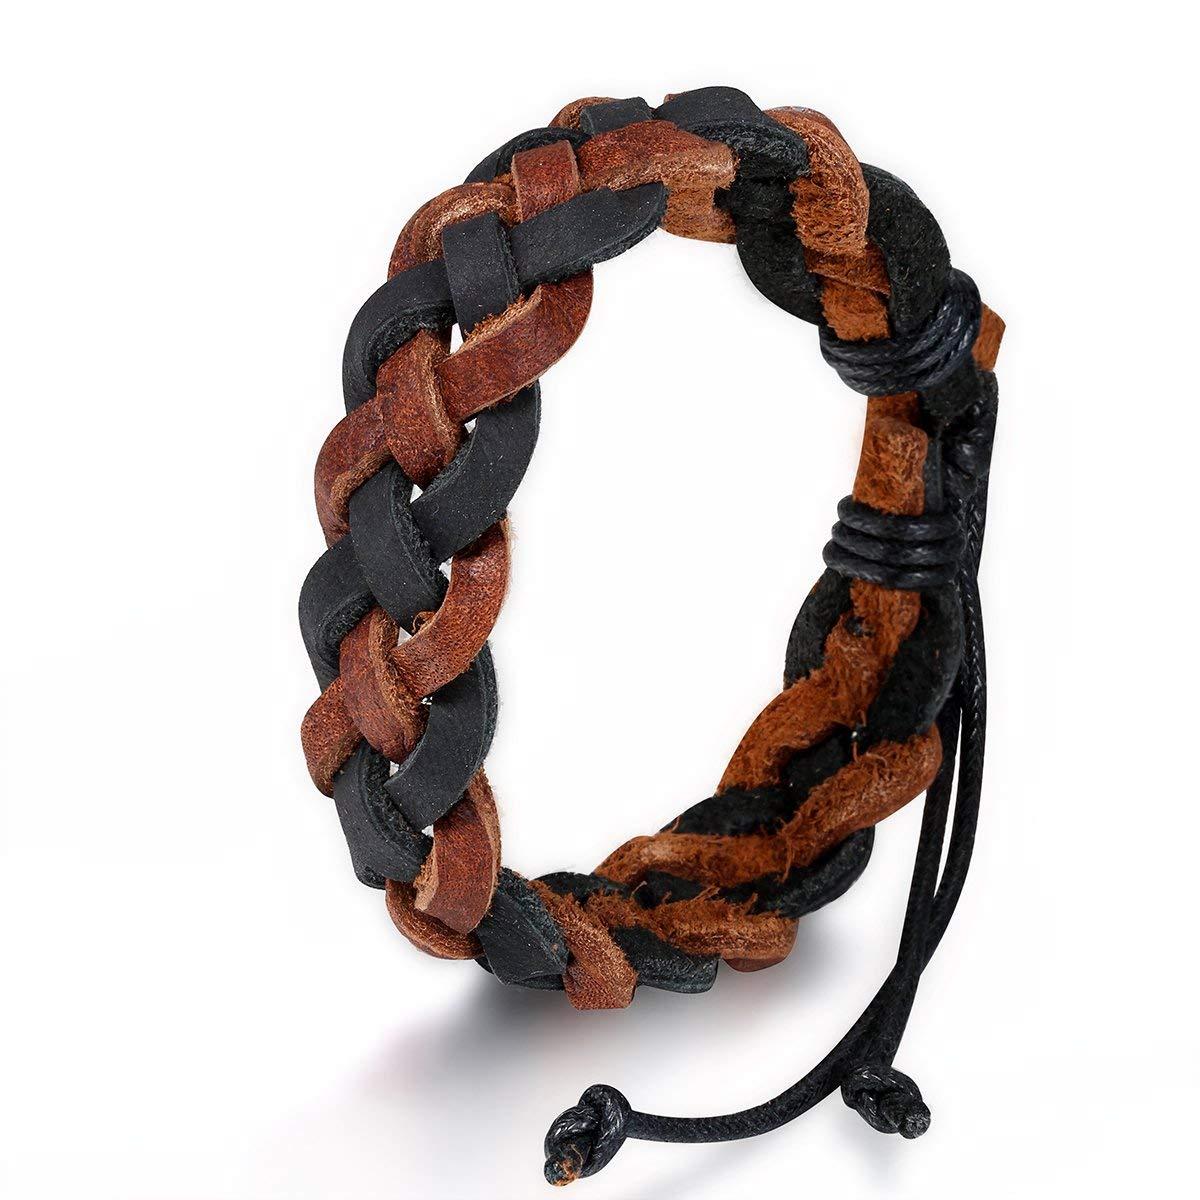 Flongo Men's Woven Braided Leather Rope Wrap Cuff Bracelet, Fit 7.5-10 inch Wrist